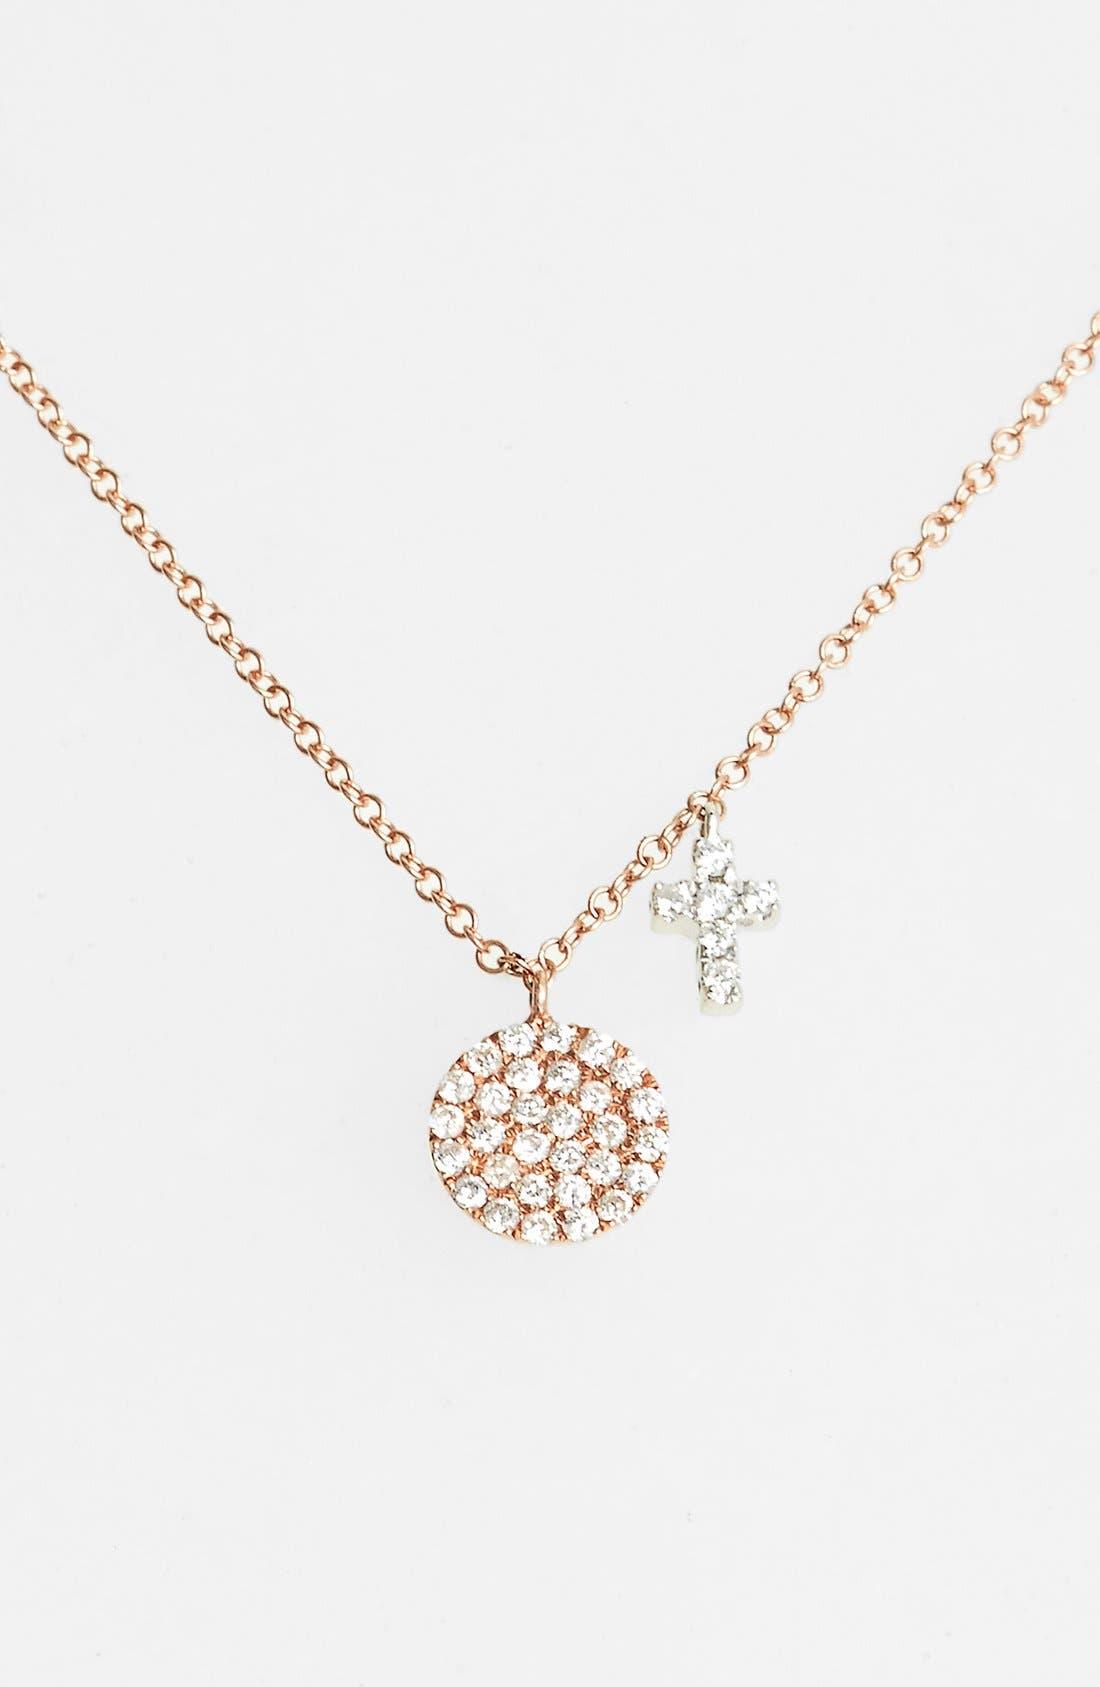 Alternate Image 1 Selected - MeiraT 'Dazzling' Diamond Disc Pendant Necklace